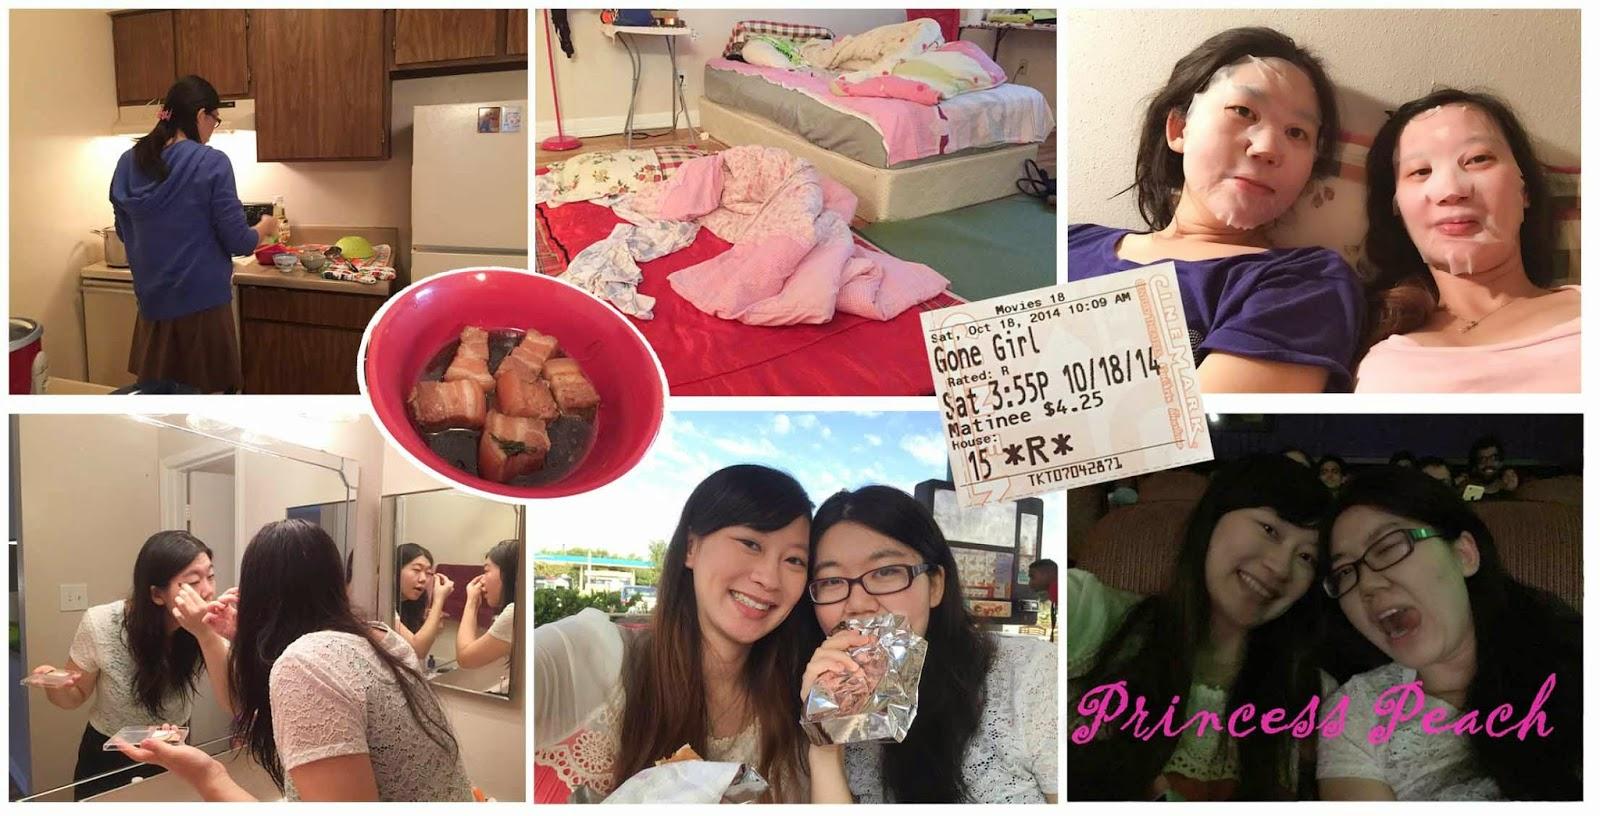 http://twpeach.blogspot.com/2014/10/pregnancy-diary11.html